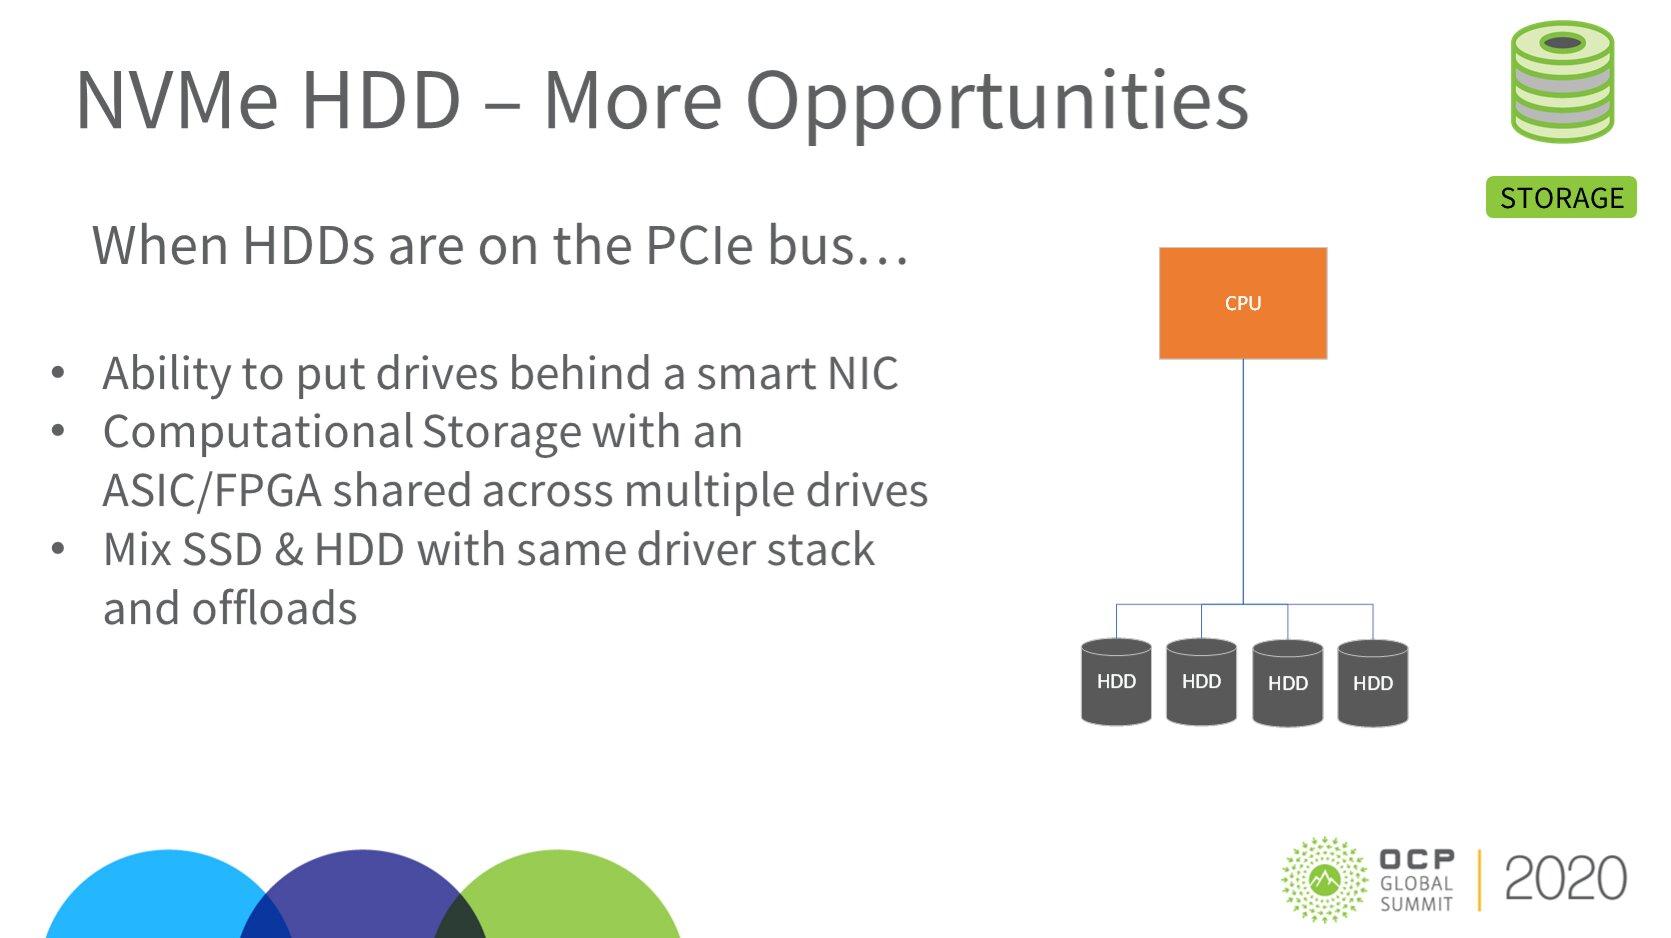 OCP Summit 2020: NVMe-HDDs